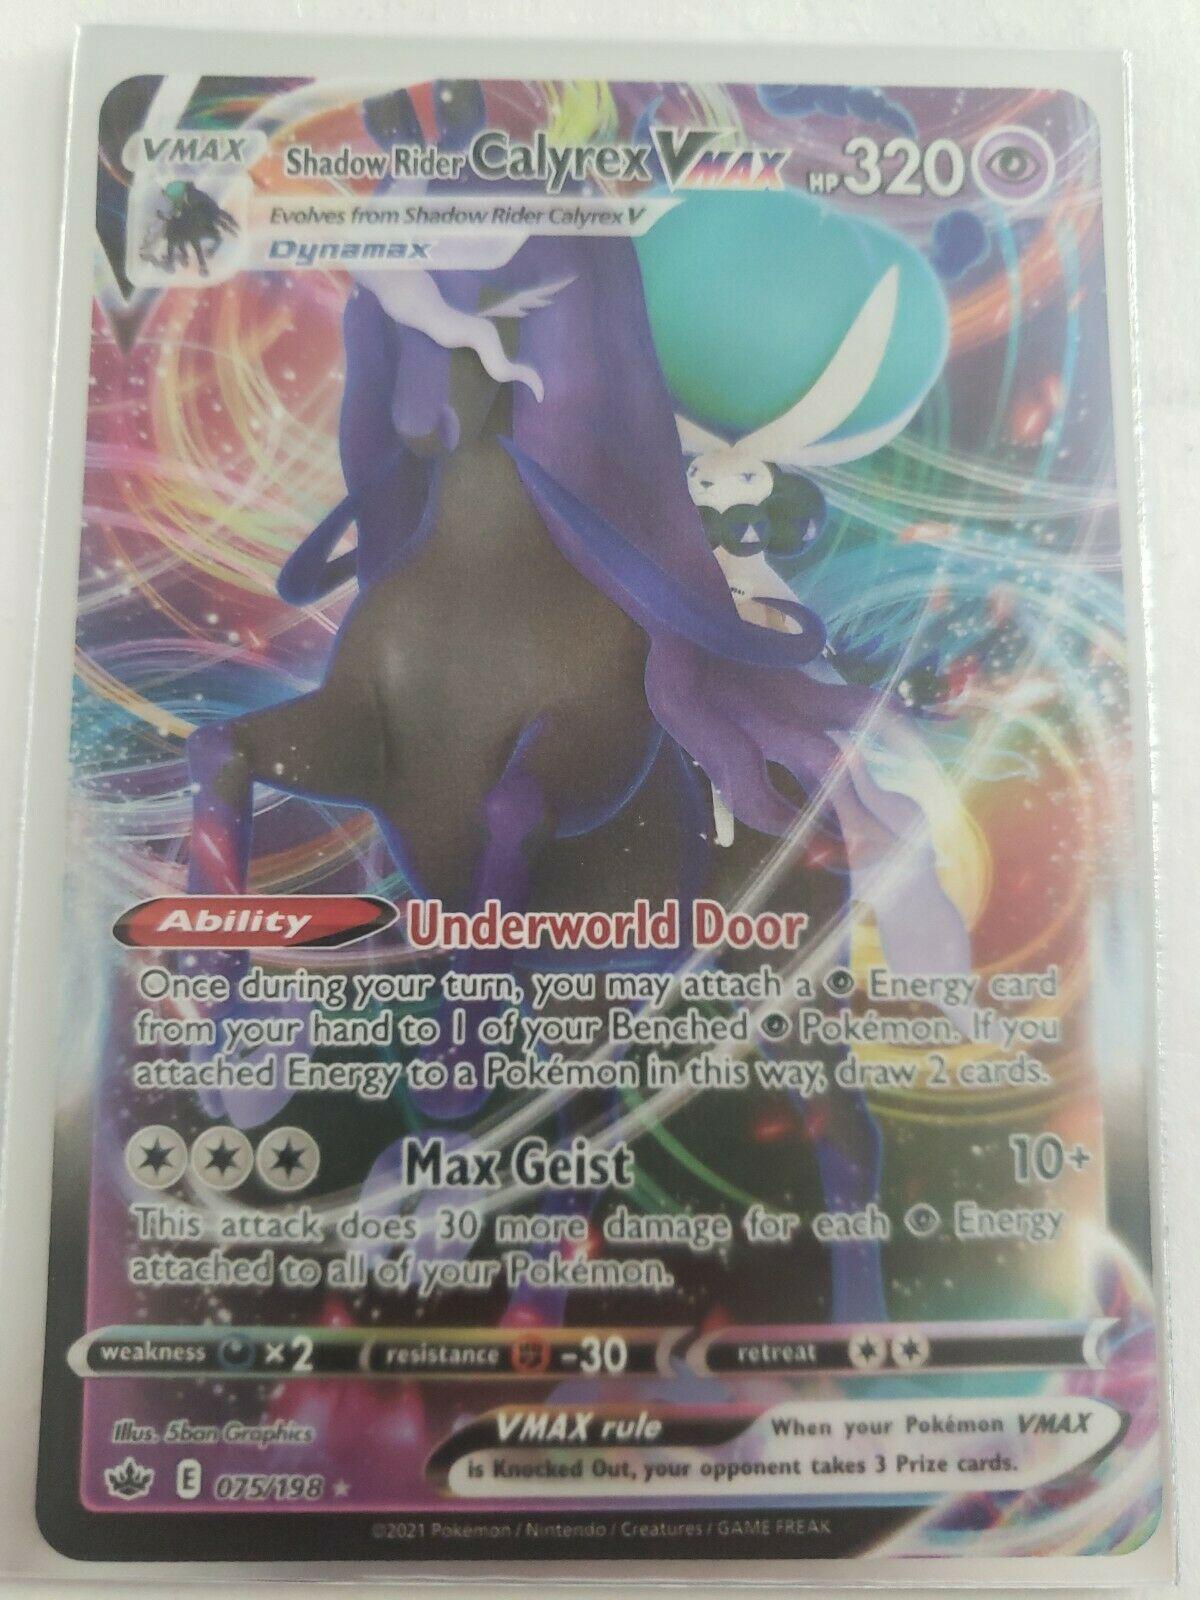 Pokémon Shadow Rider Calyrex Vmax Ultra Rare Chilling Reign 075/198 NM/MINT